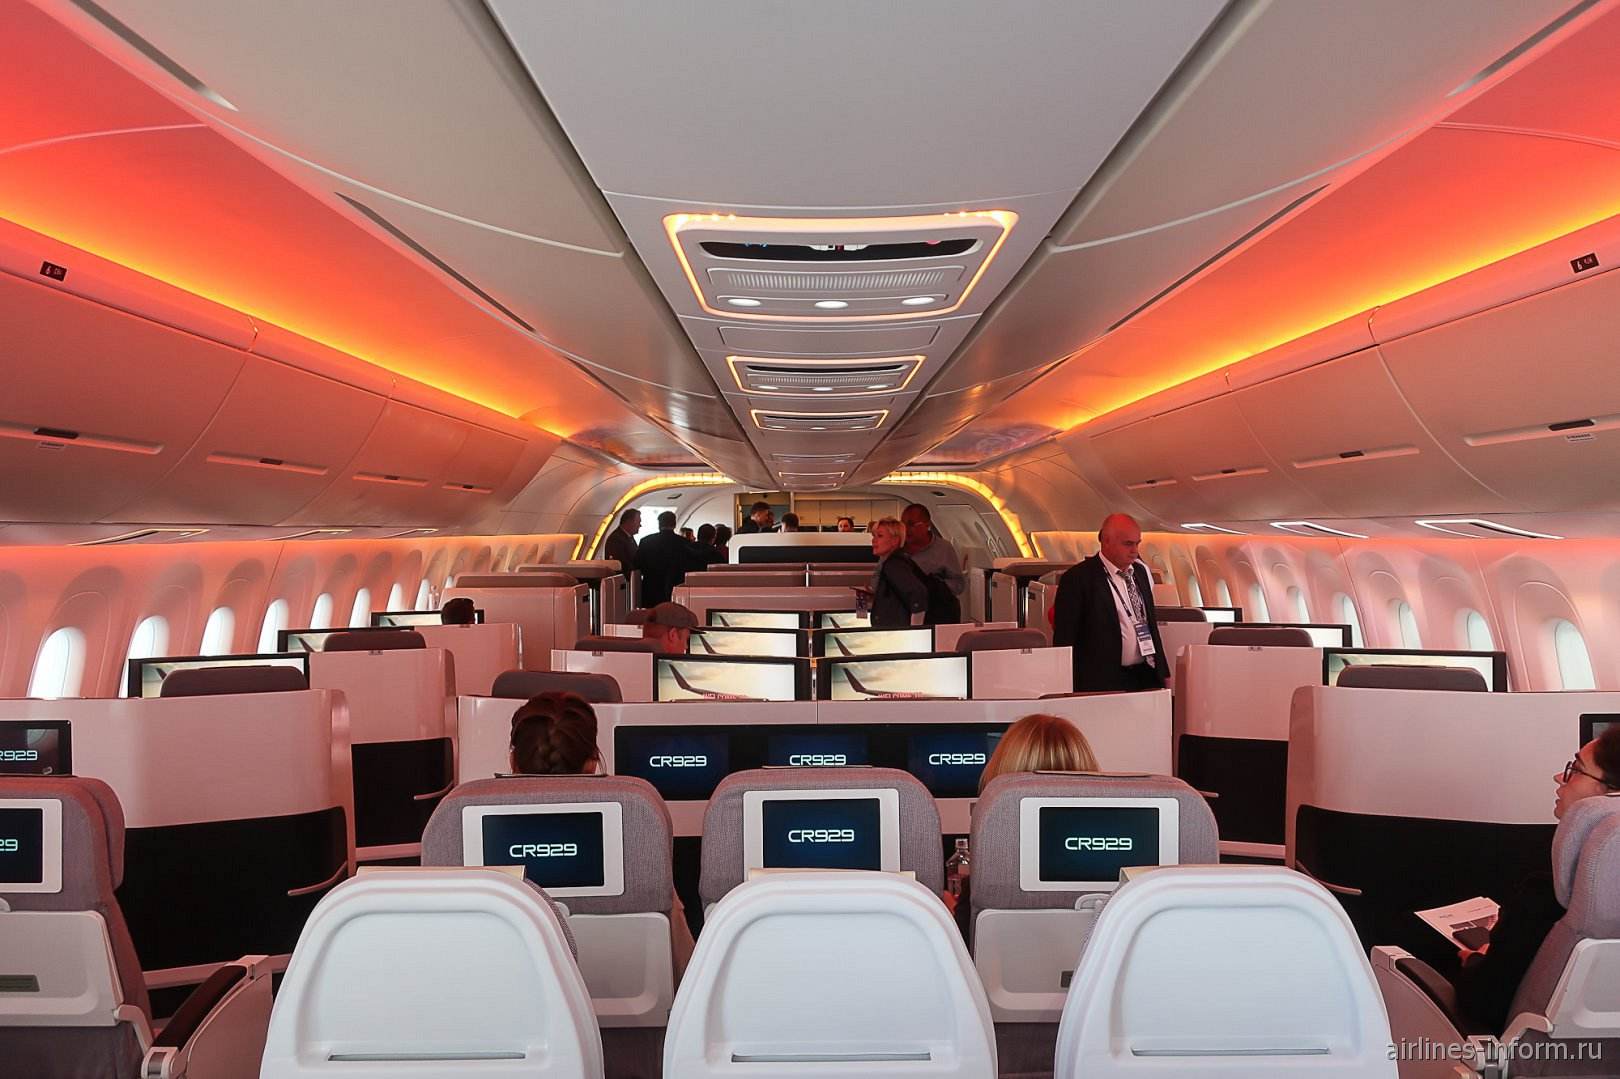 Пассажирский салон самолета CR929